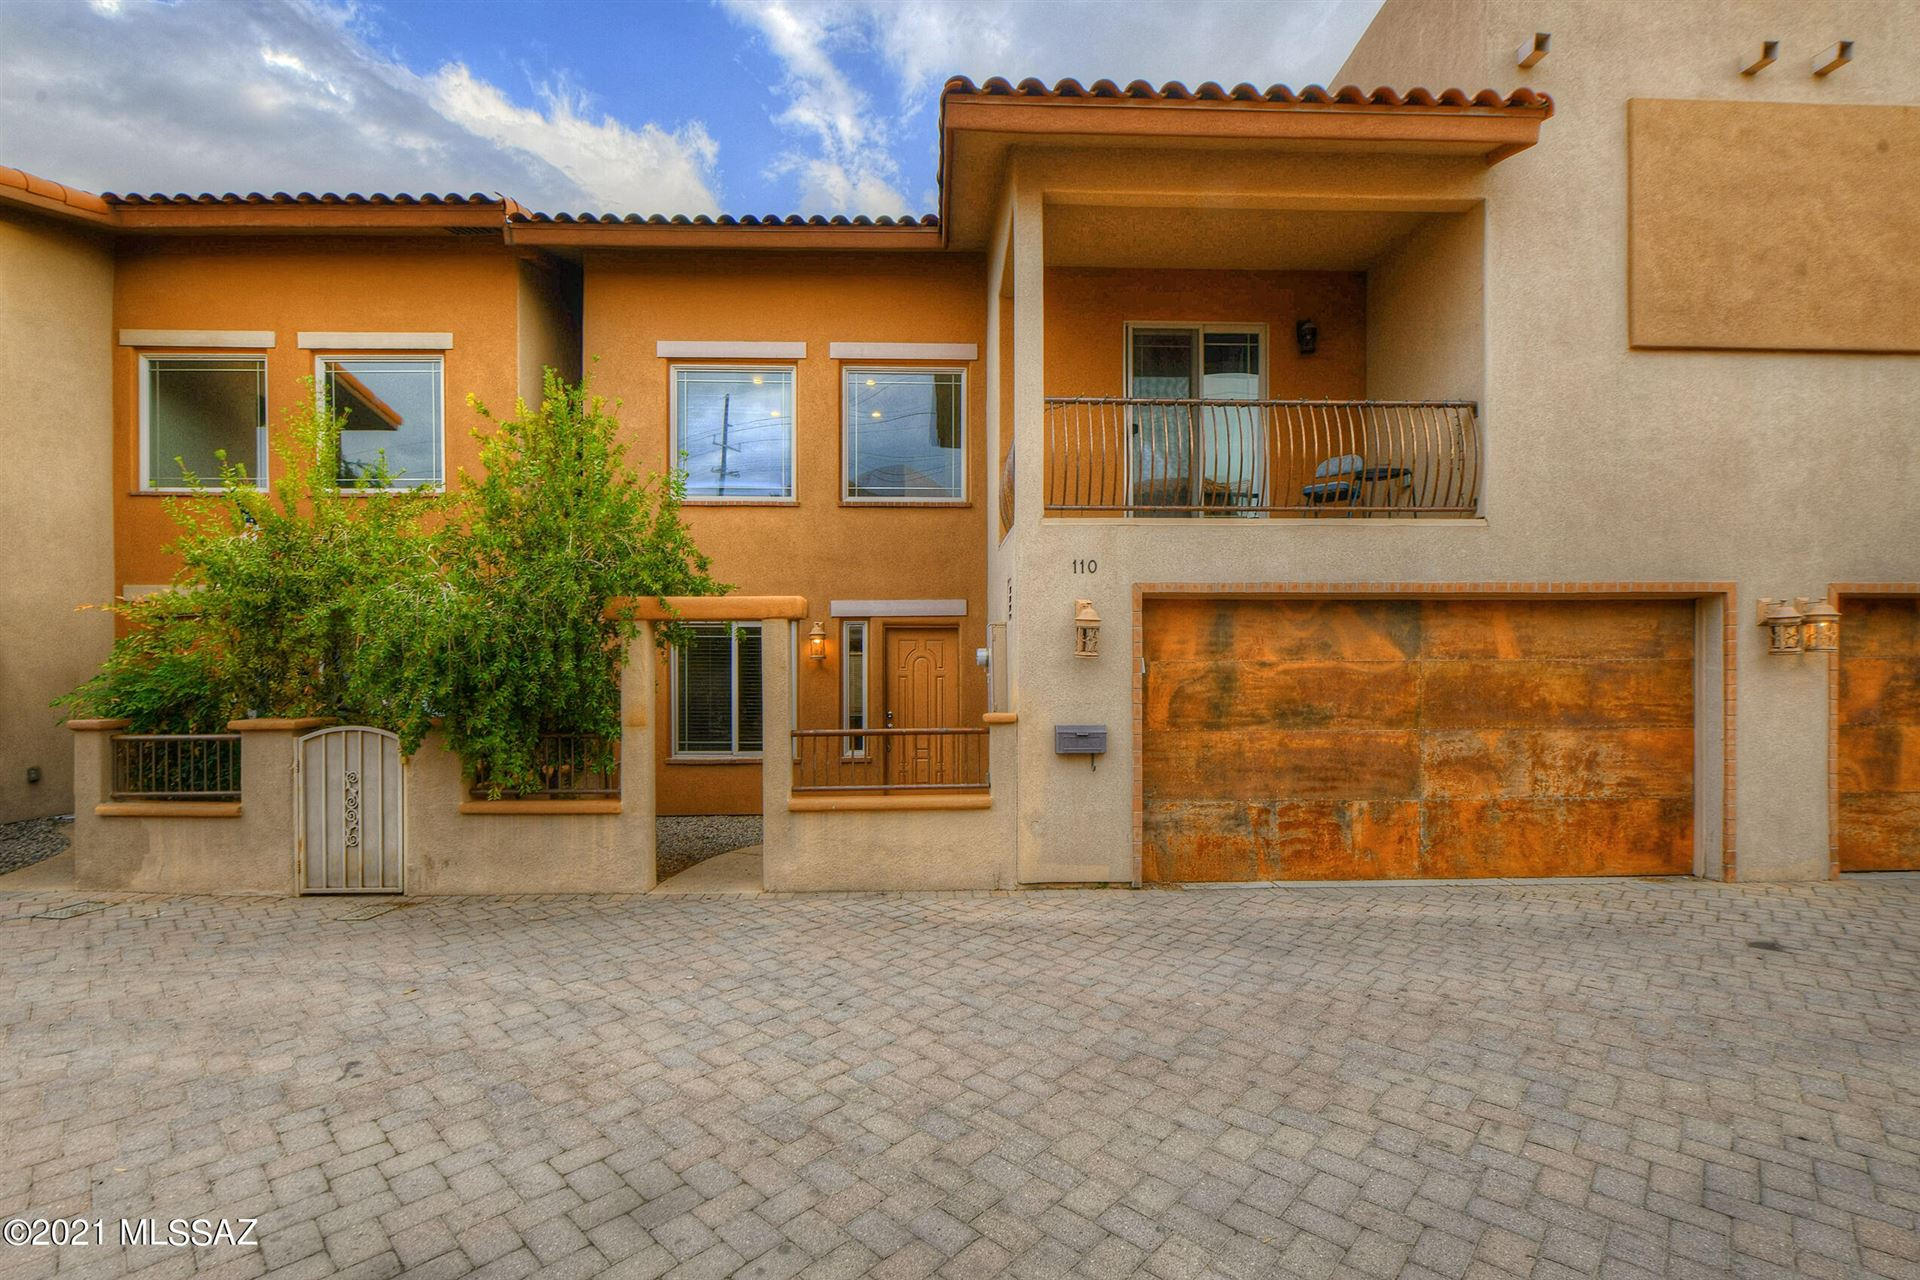 110 S Placita Colonia Solana, Tucson, AZ 85716 - MLS#: 22118290